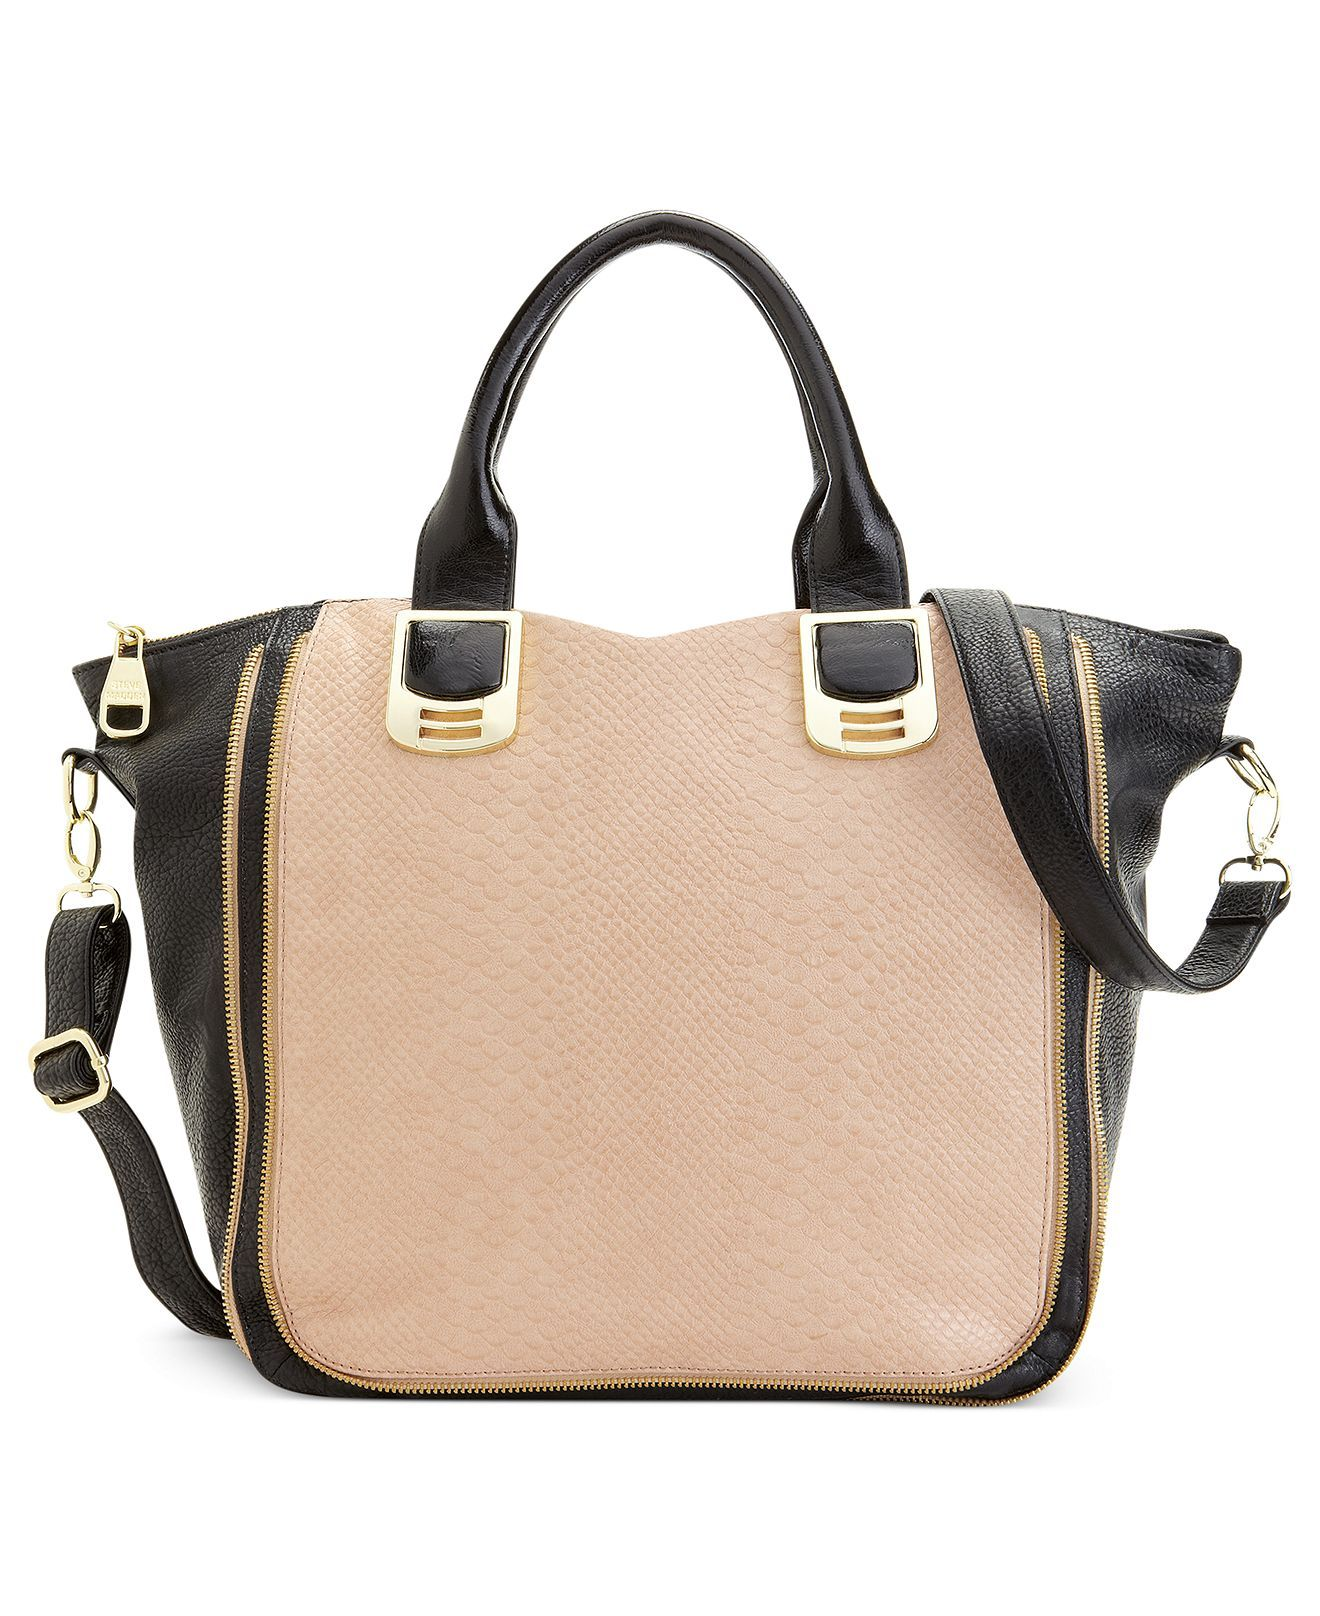 a62ee29c49d Steve Madden Handbag, Bgambet Shopper - Handbags & Accessories - Macy's